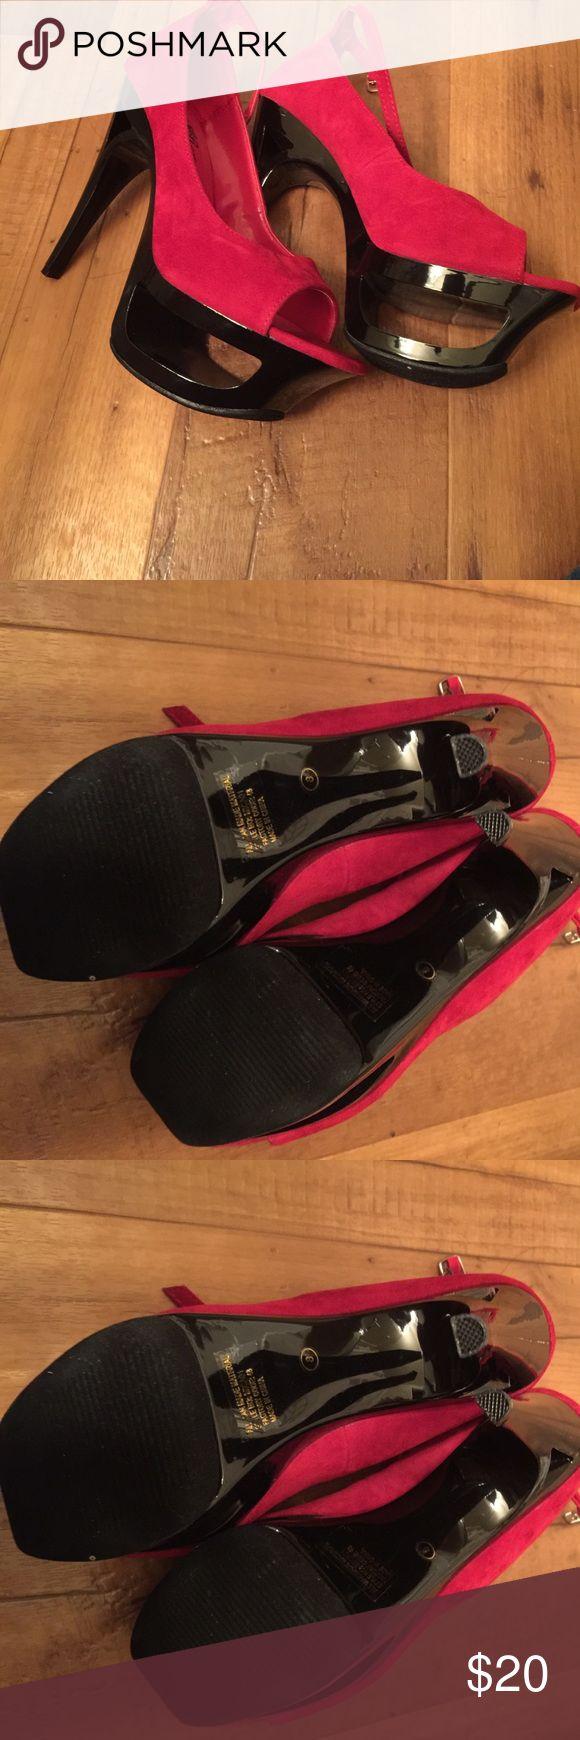 Red Wild Rose 🌹 size 8 Platform Stilettos 👠 Only worn once Red Wild Rose 🌹 size 8 Platform Stilettos 👠 ... wild rose Shoes Platforms